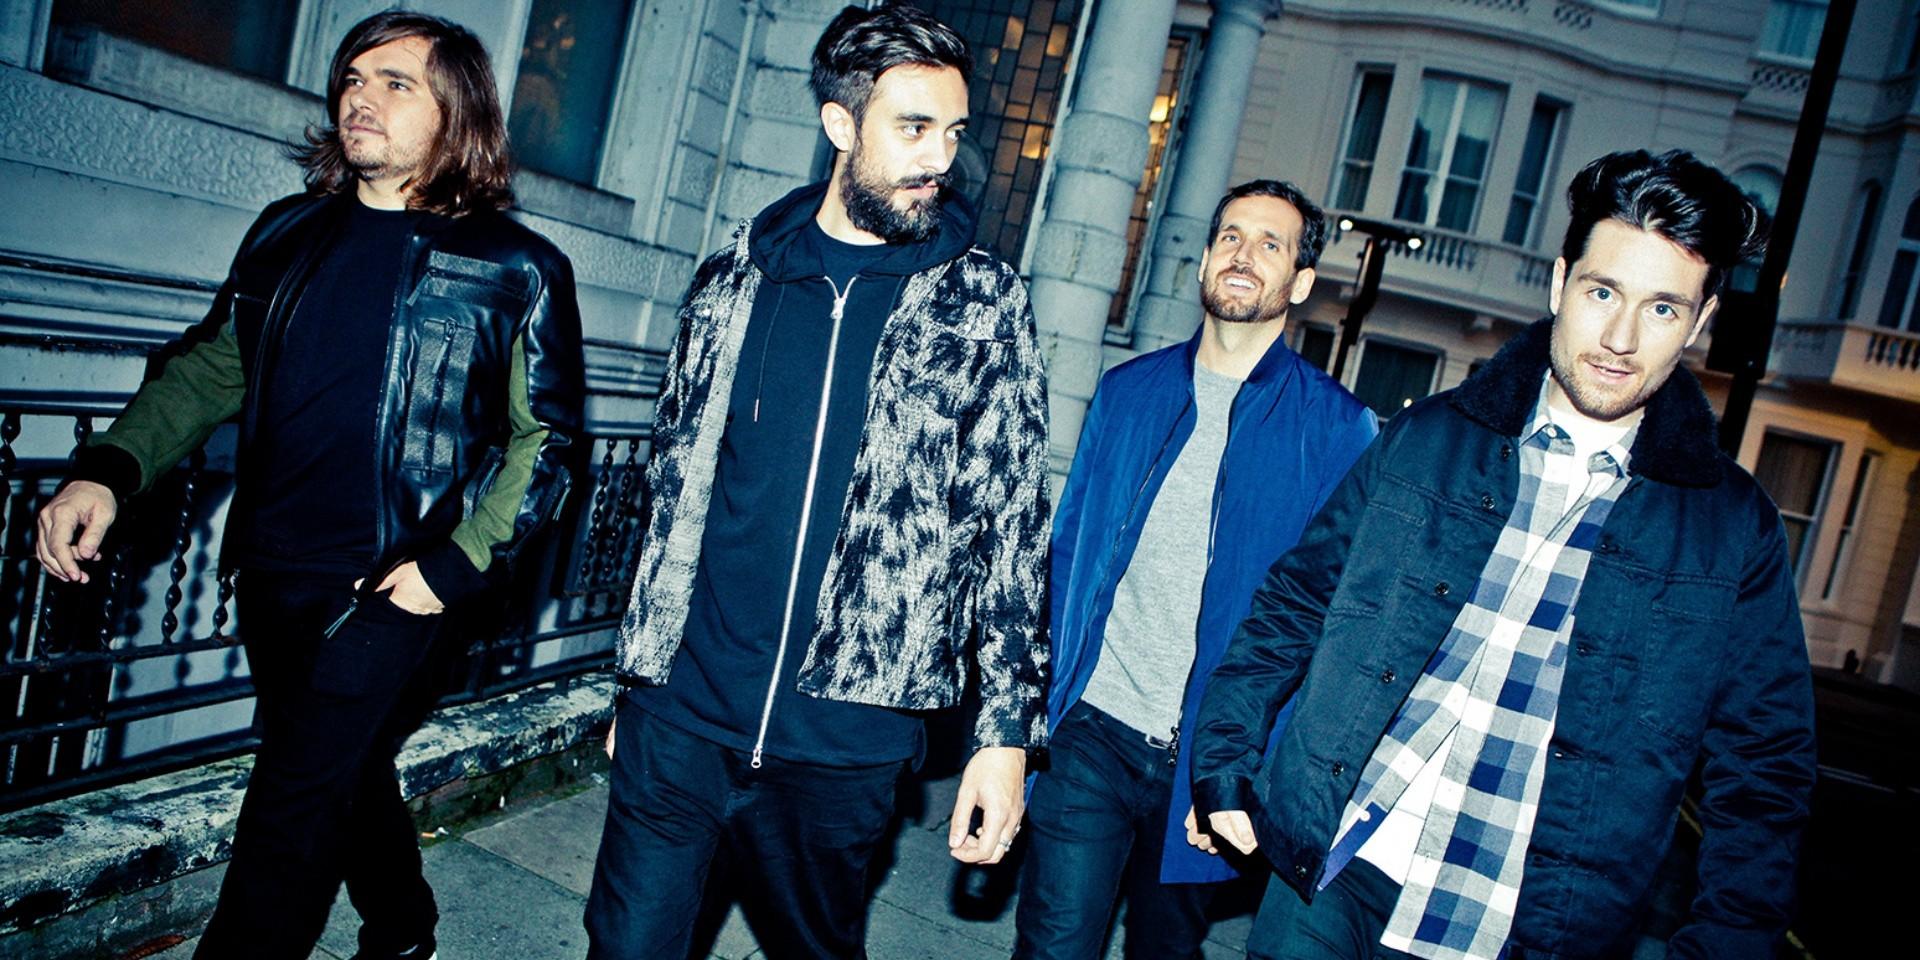 Bastille announces immersive theatrical experience, Still Avoiding Tomorrow, to accompany upcoming album